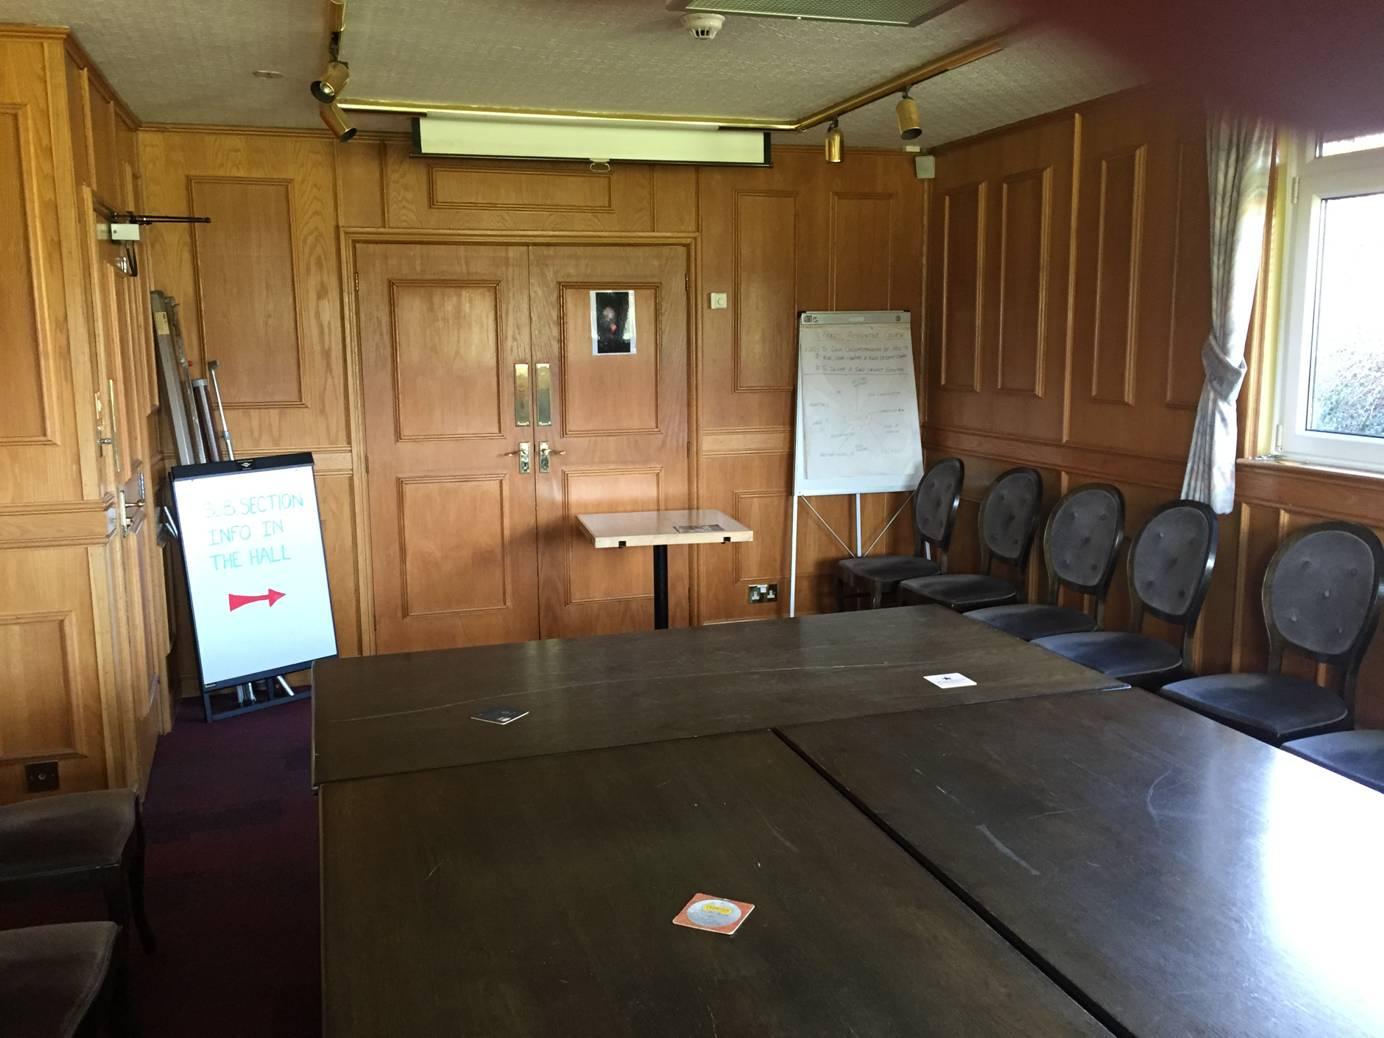 The workshop room at Hursley Park. Image kindly supplied by Glenn Salter.